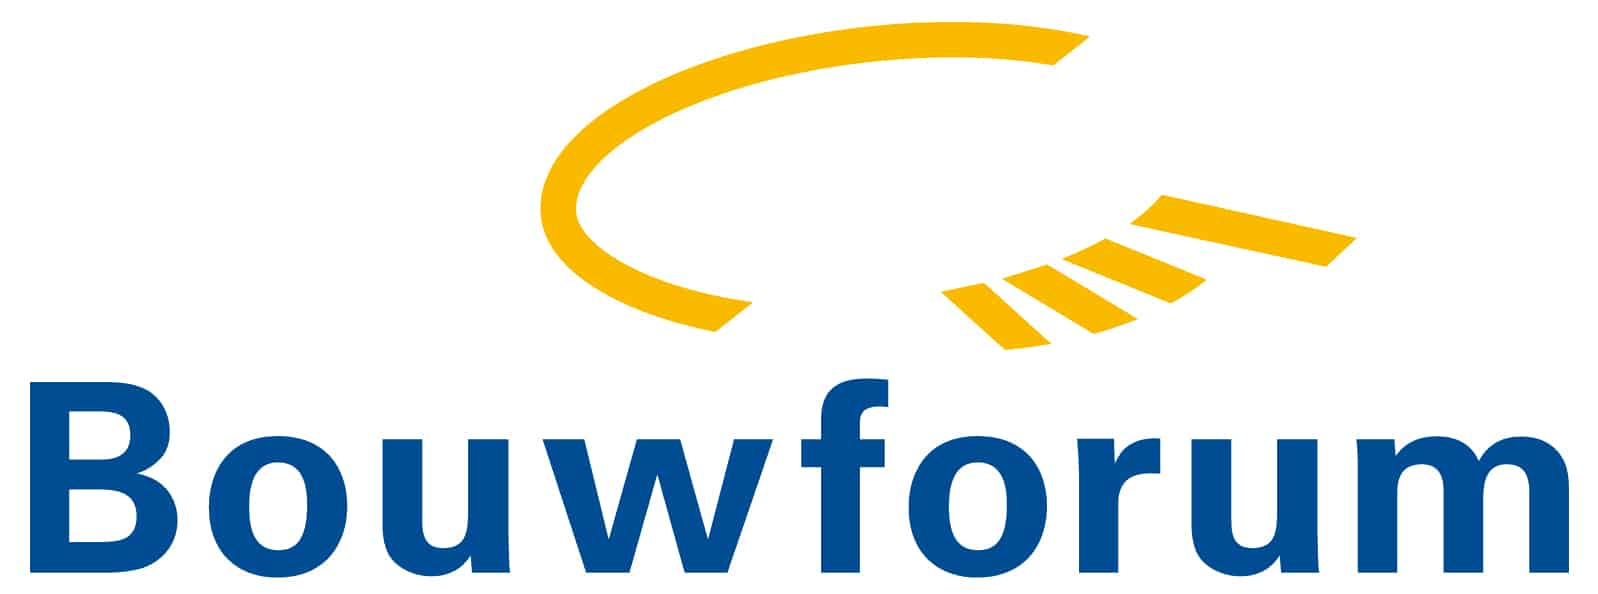 Bouwforum_logo-12